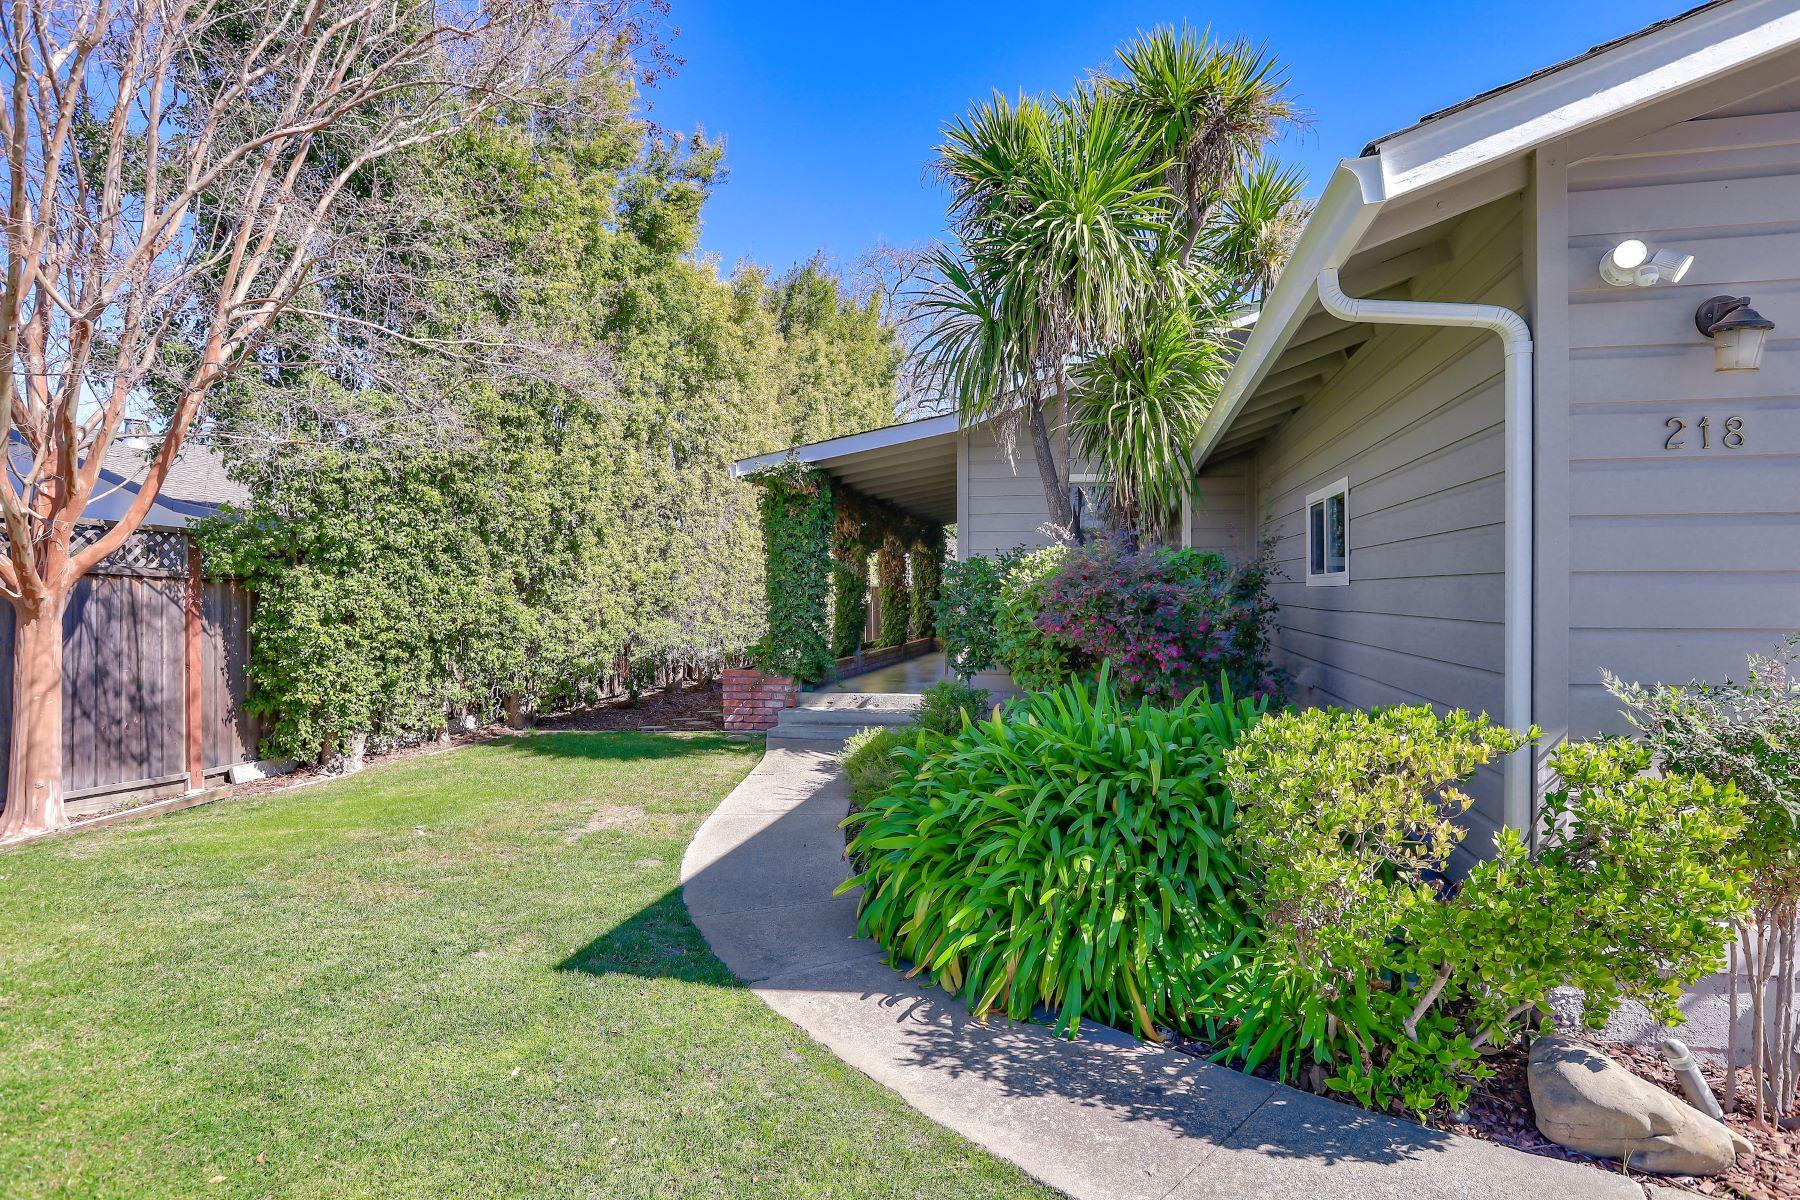 Single Family Homes para Venda às Ranch Home in Los Gatos! 218 Mattson Avenue, Los Gatos, Califórnia 95032 Estados Unidos